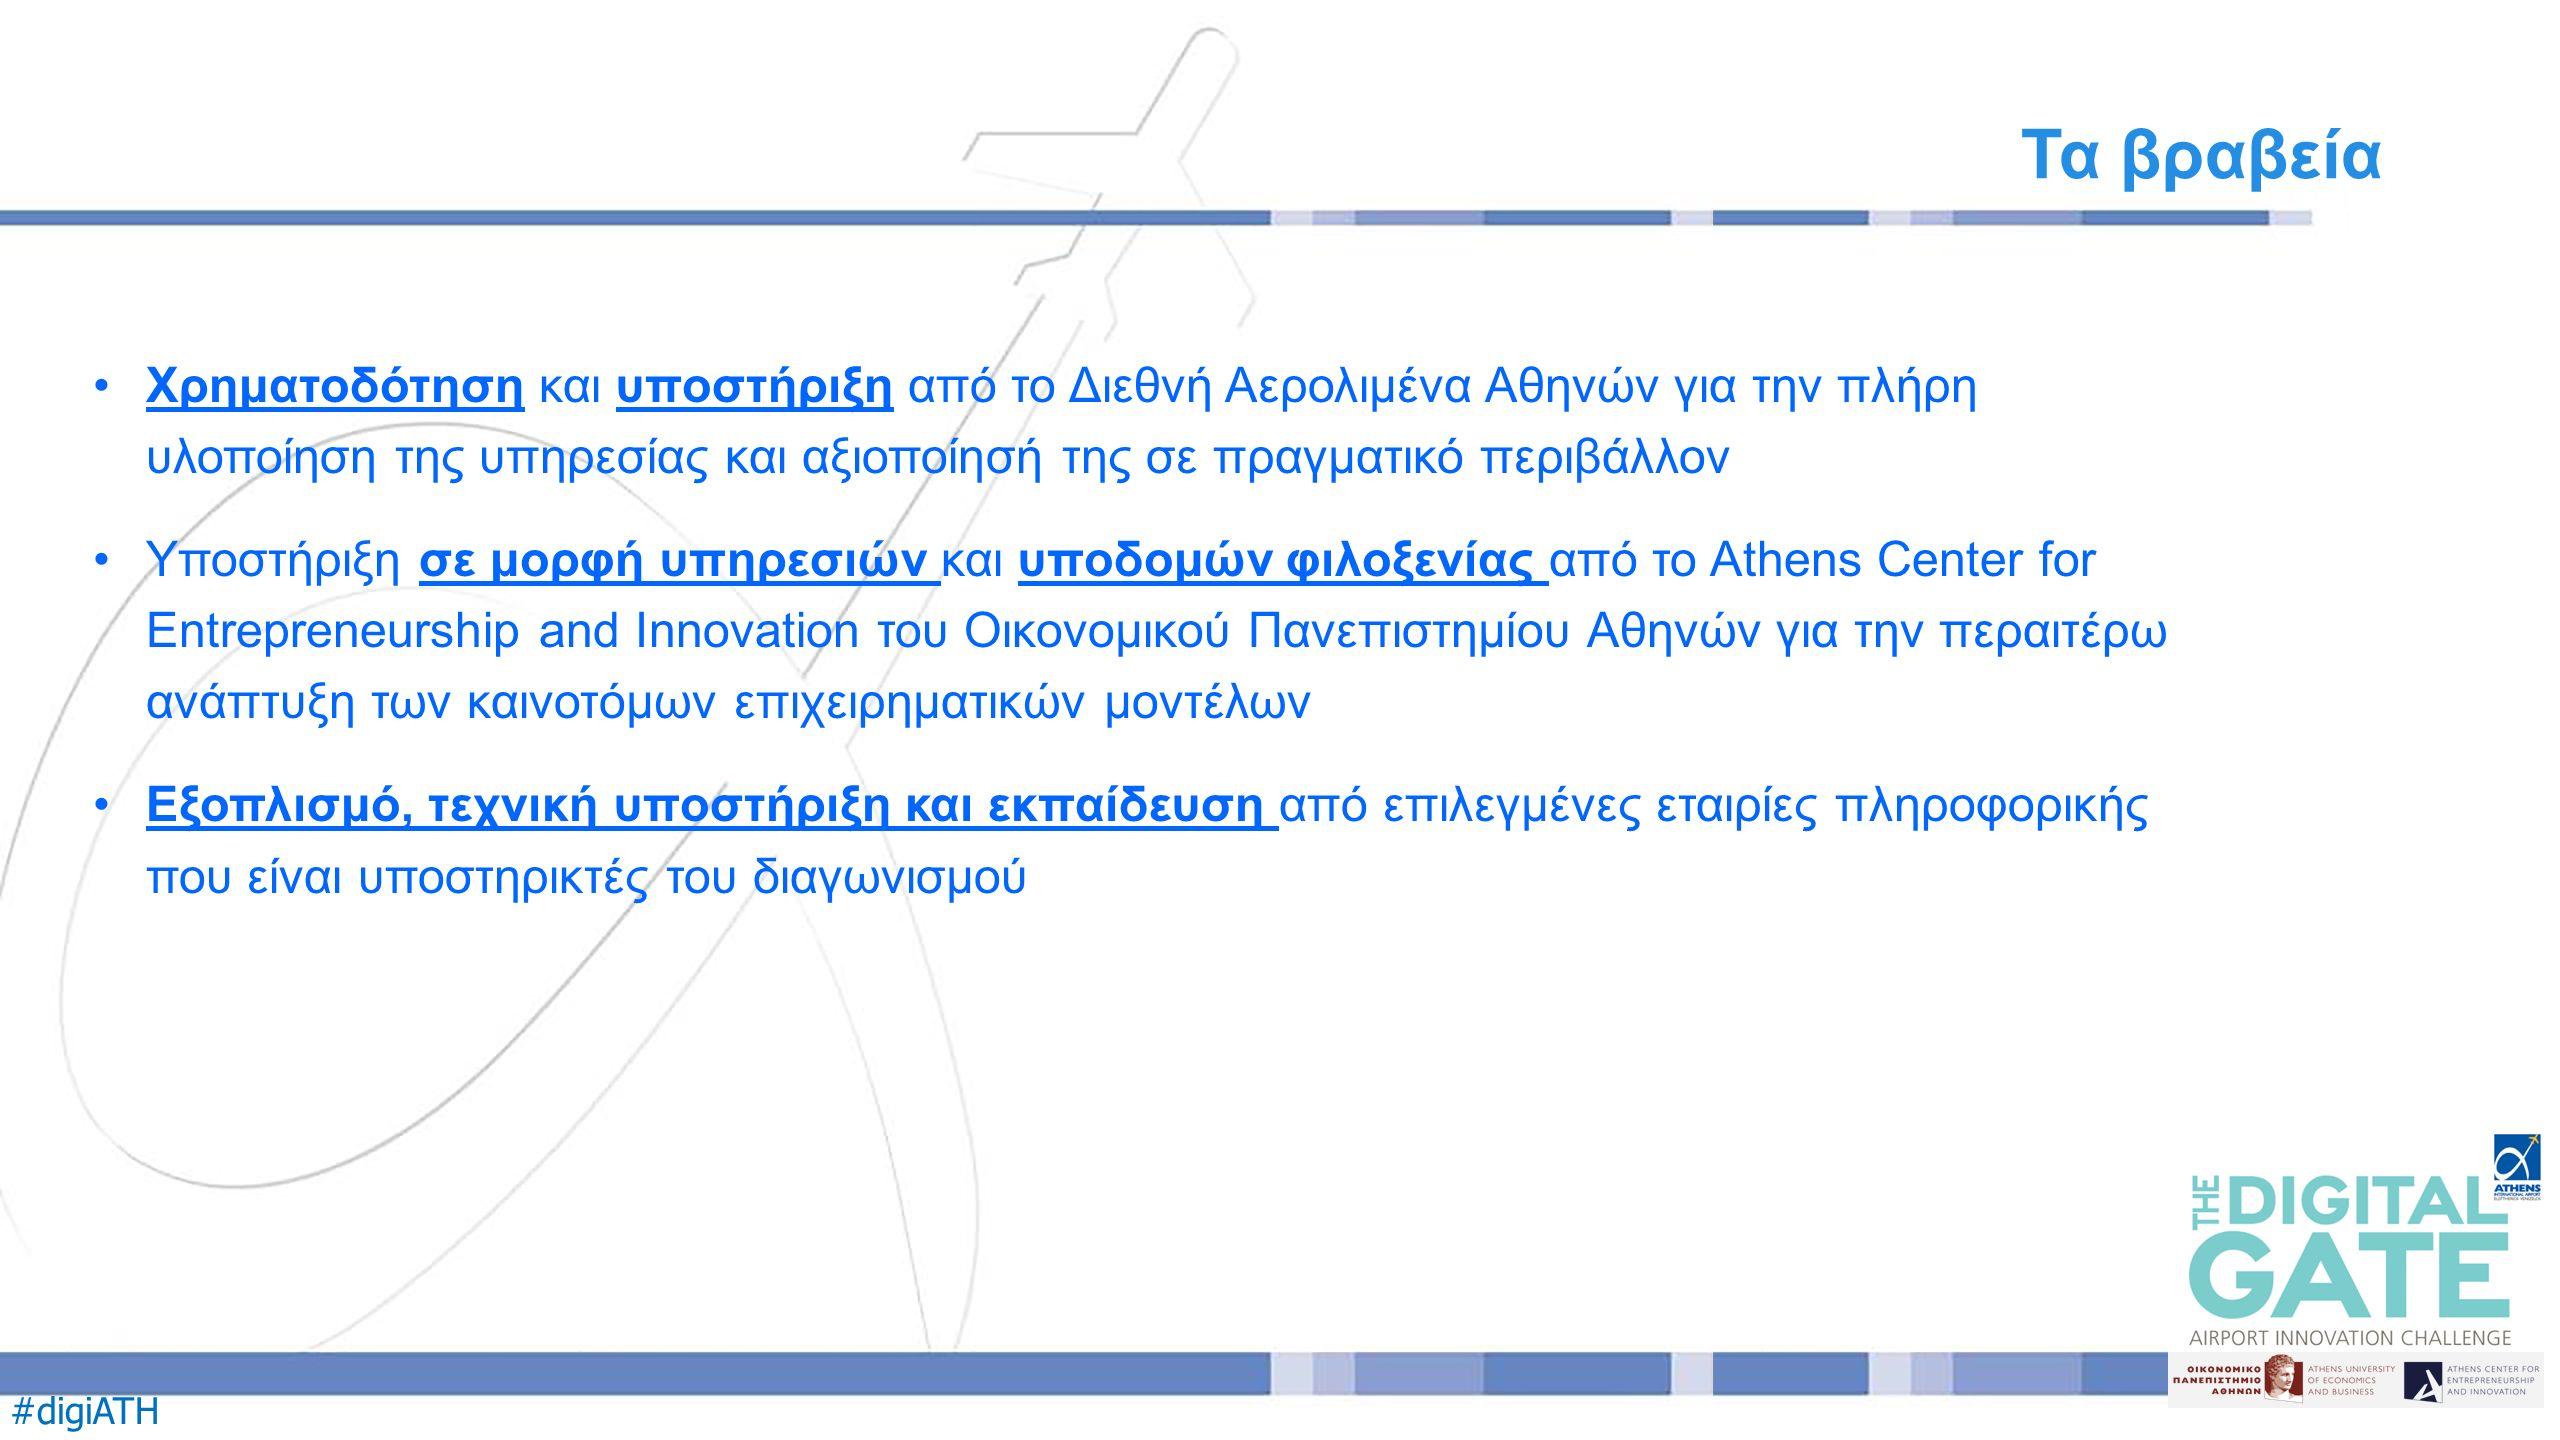 #digiATH Χρηματοδότηση και υποστήριξη από το Διεθνή Αερολιμένα Αθηνών για την πλήρη υλοποίηση της υπηρεσίας και αξιοποίησή της σε πραγματικό περιβάλλον Υποστήριξη σε μορφή υπηρεσιών και υποδομών φιλοξενίας από το Athens Center for Entrepreneurship and Innovation του Οικονομικού Πανεπιστημίου Αθηνών για την περαιτέρω ανάπτυξη των καινοτόμων επιχειρηματικών μοντέλων Εξοπλισμό, τεχνική υποστήριξη και εκπαίδευση από επιλεγμένες εταιρίες πληροφορικής που είναι υποστηρικτές του διαγωνισμού Τα βραβεία